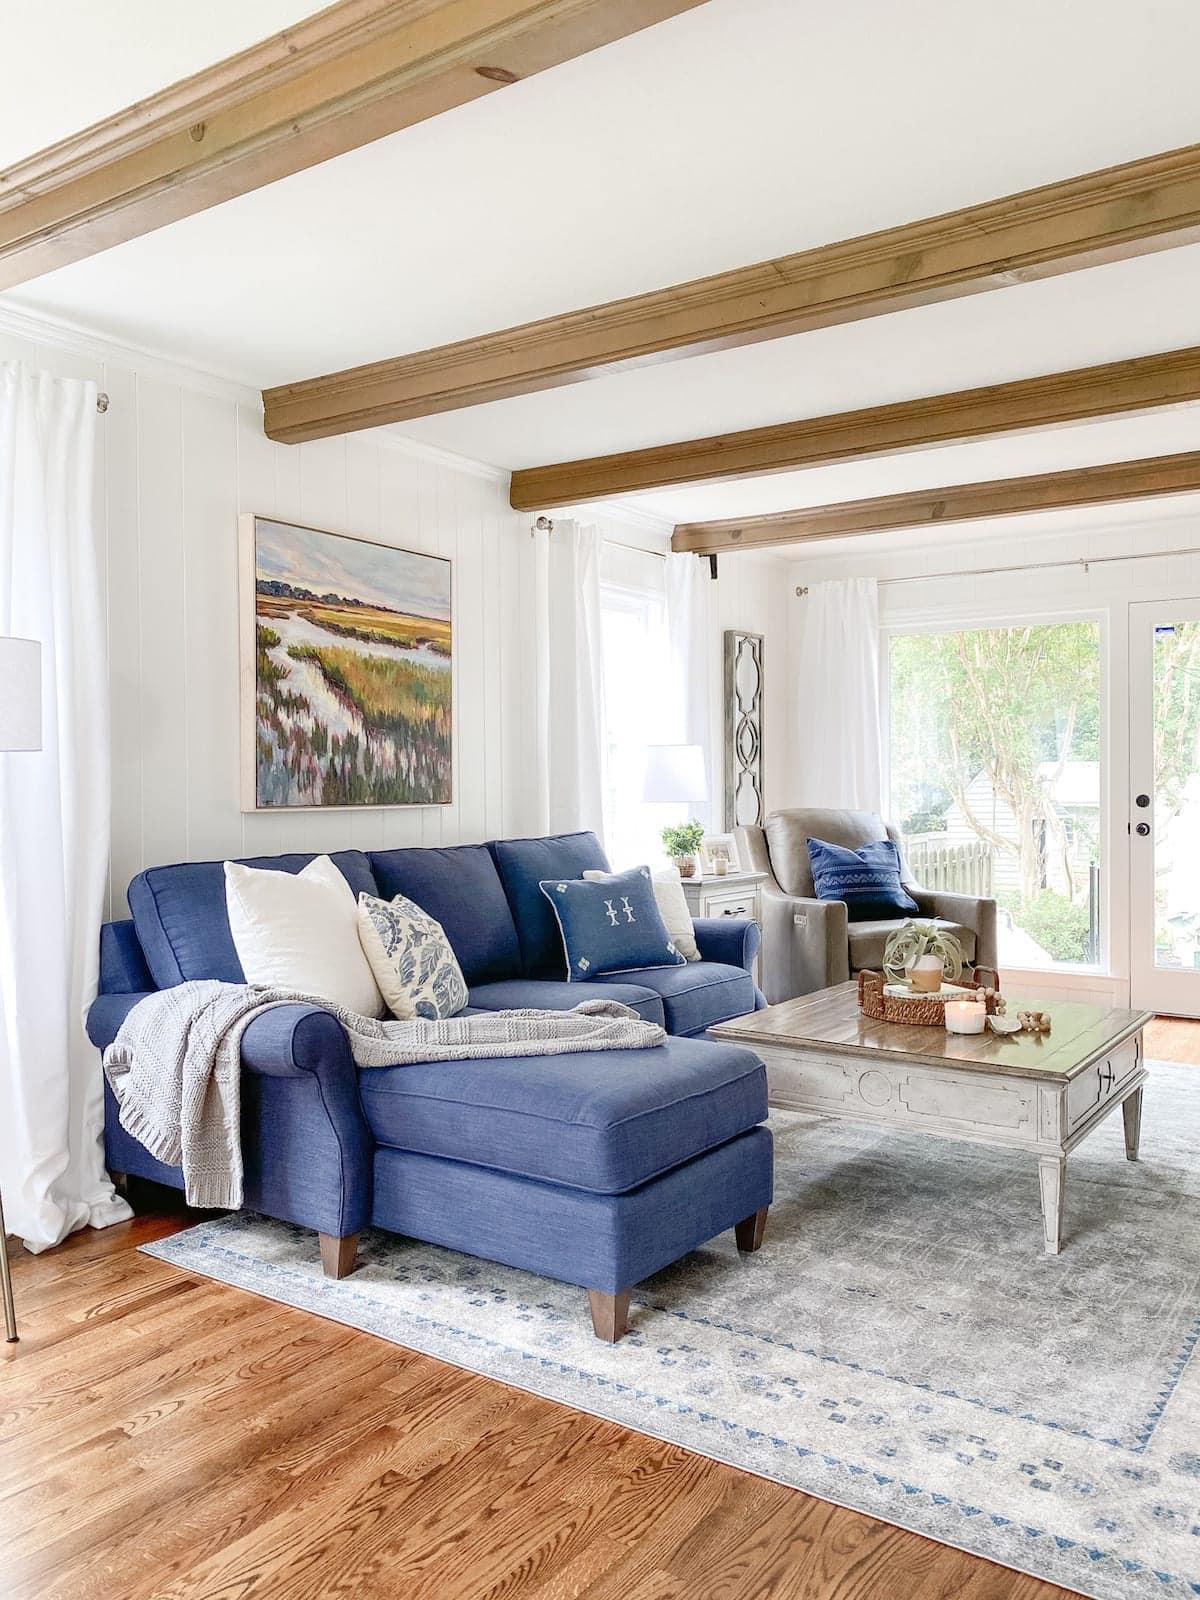 coastal living room with beams, navy sofa, rug, and weathered table